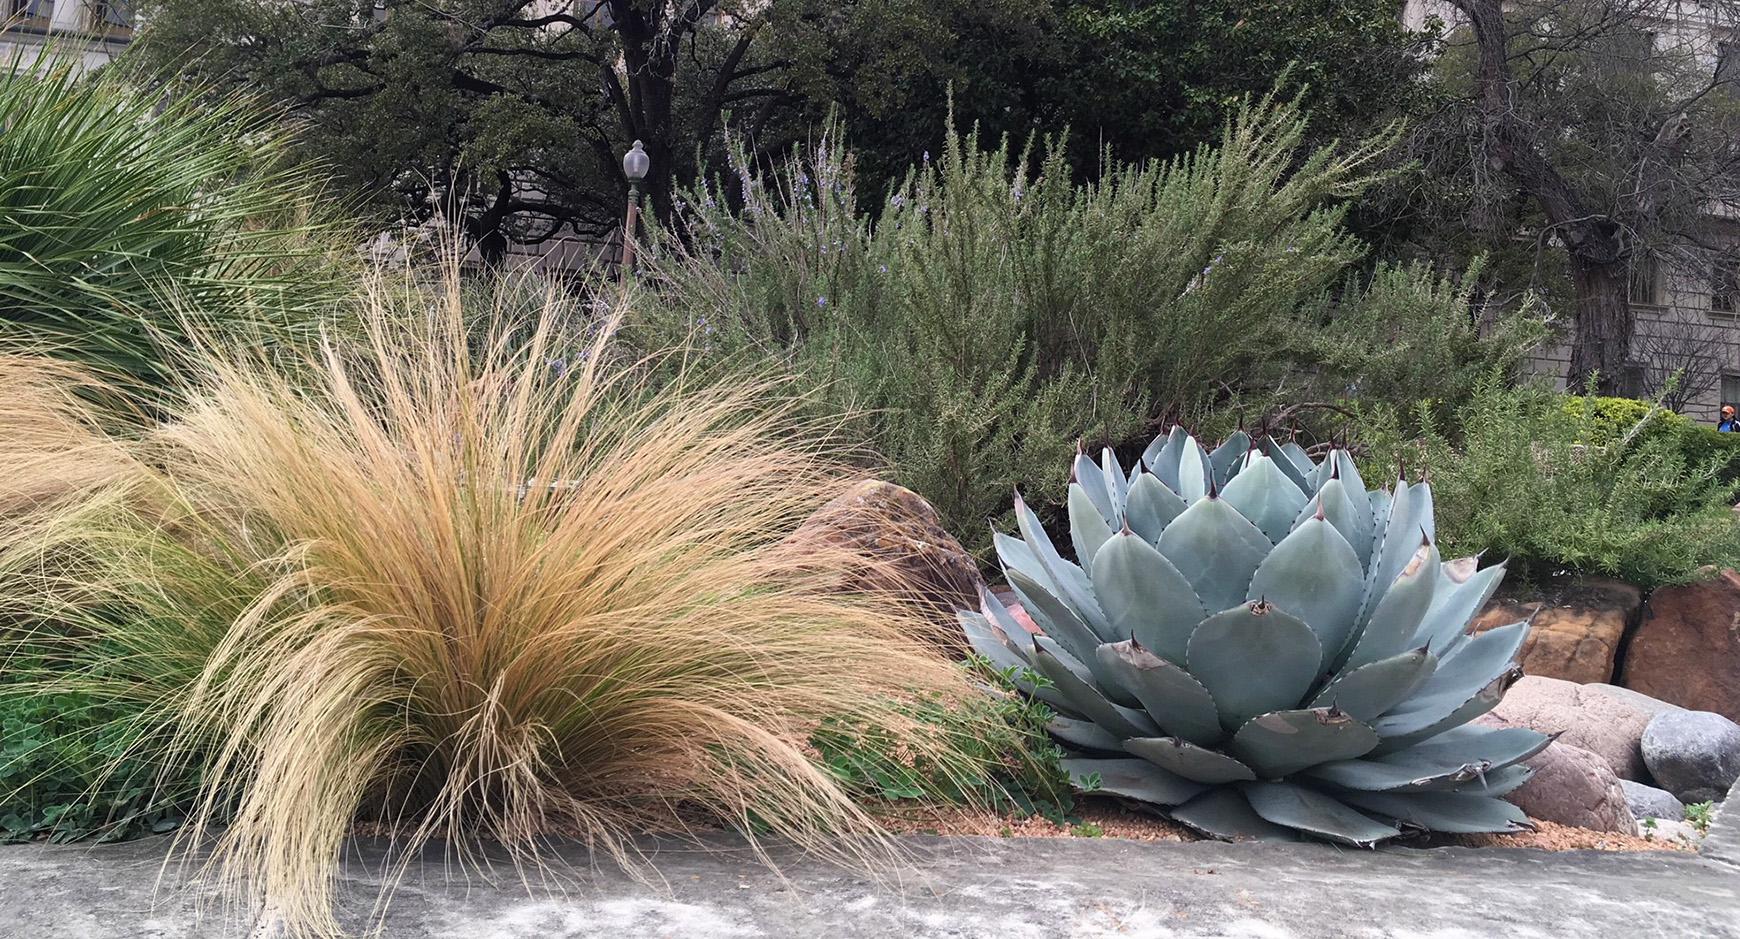 Native plants near UT tower